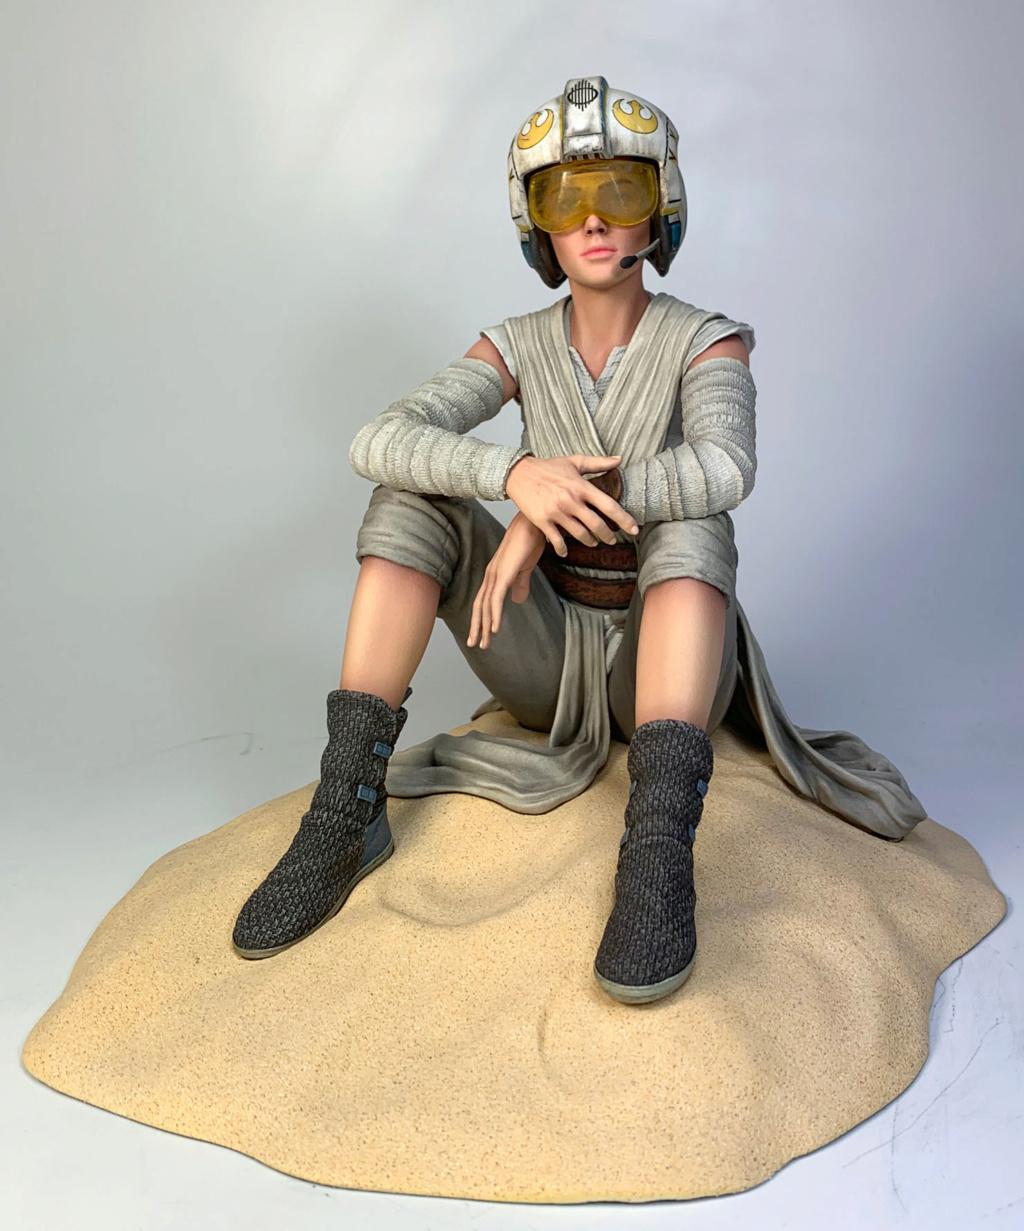 Star Wars Rey Dreamer Statue Statue - 1/7 Scale Reydre12